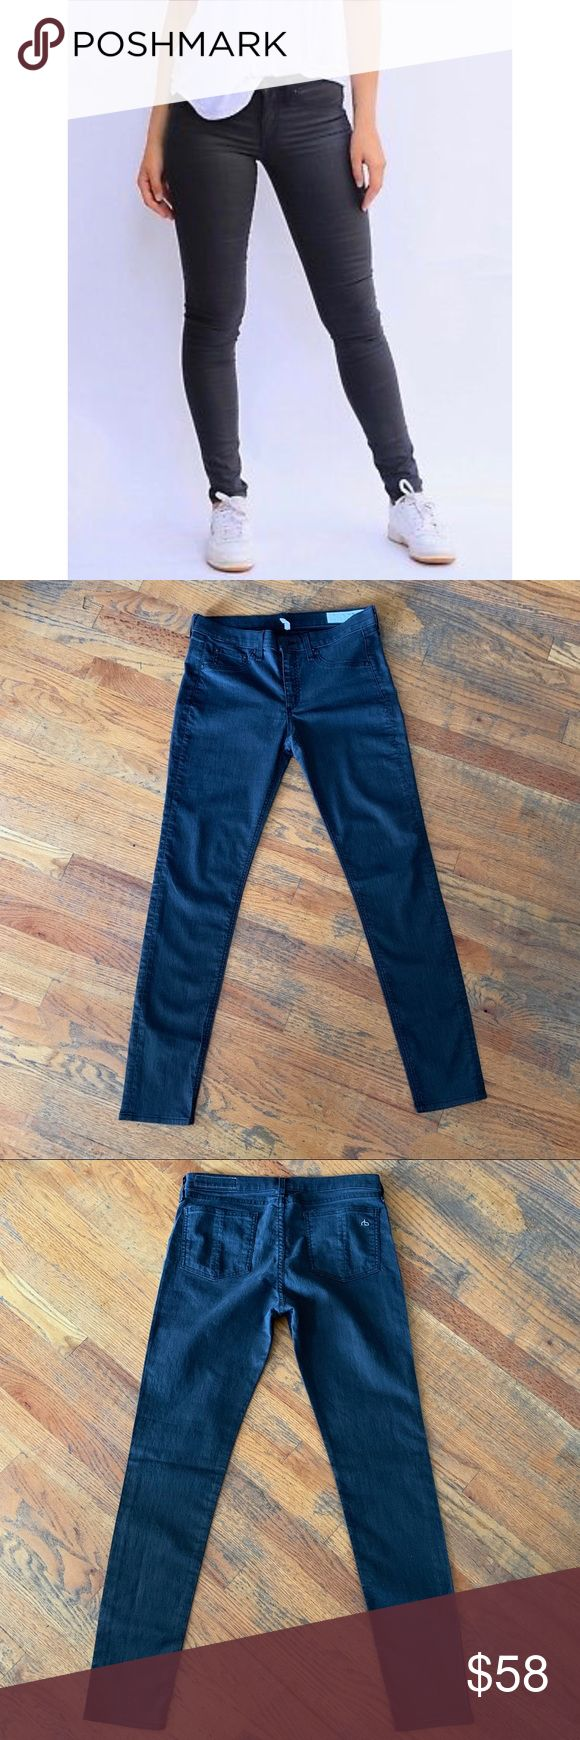 RAG & BONE Shoreditch Charcoal Gray Legging Jeans (With